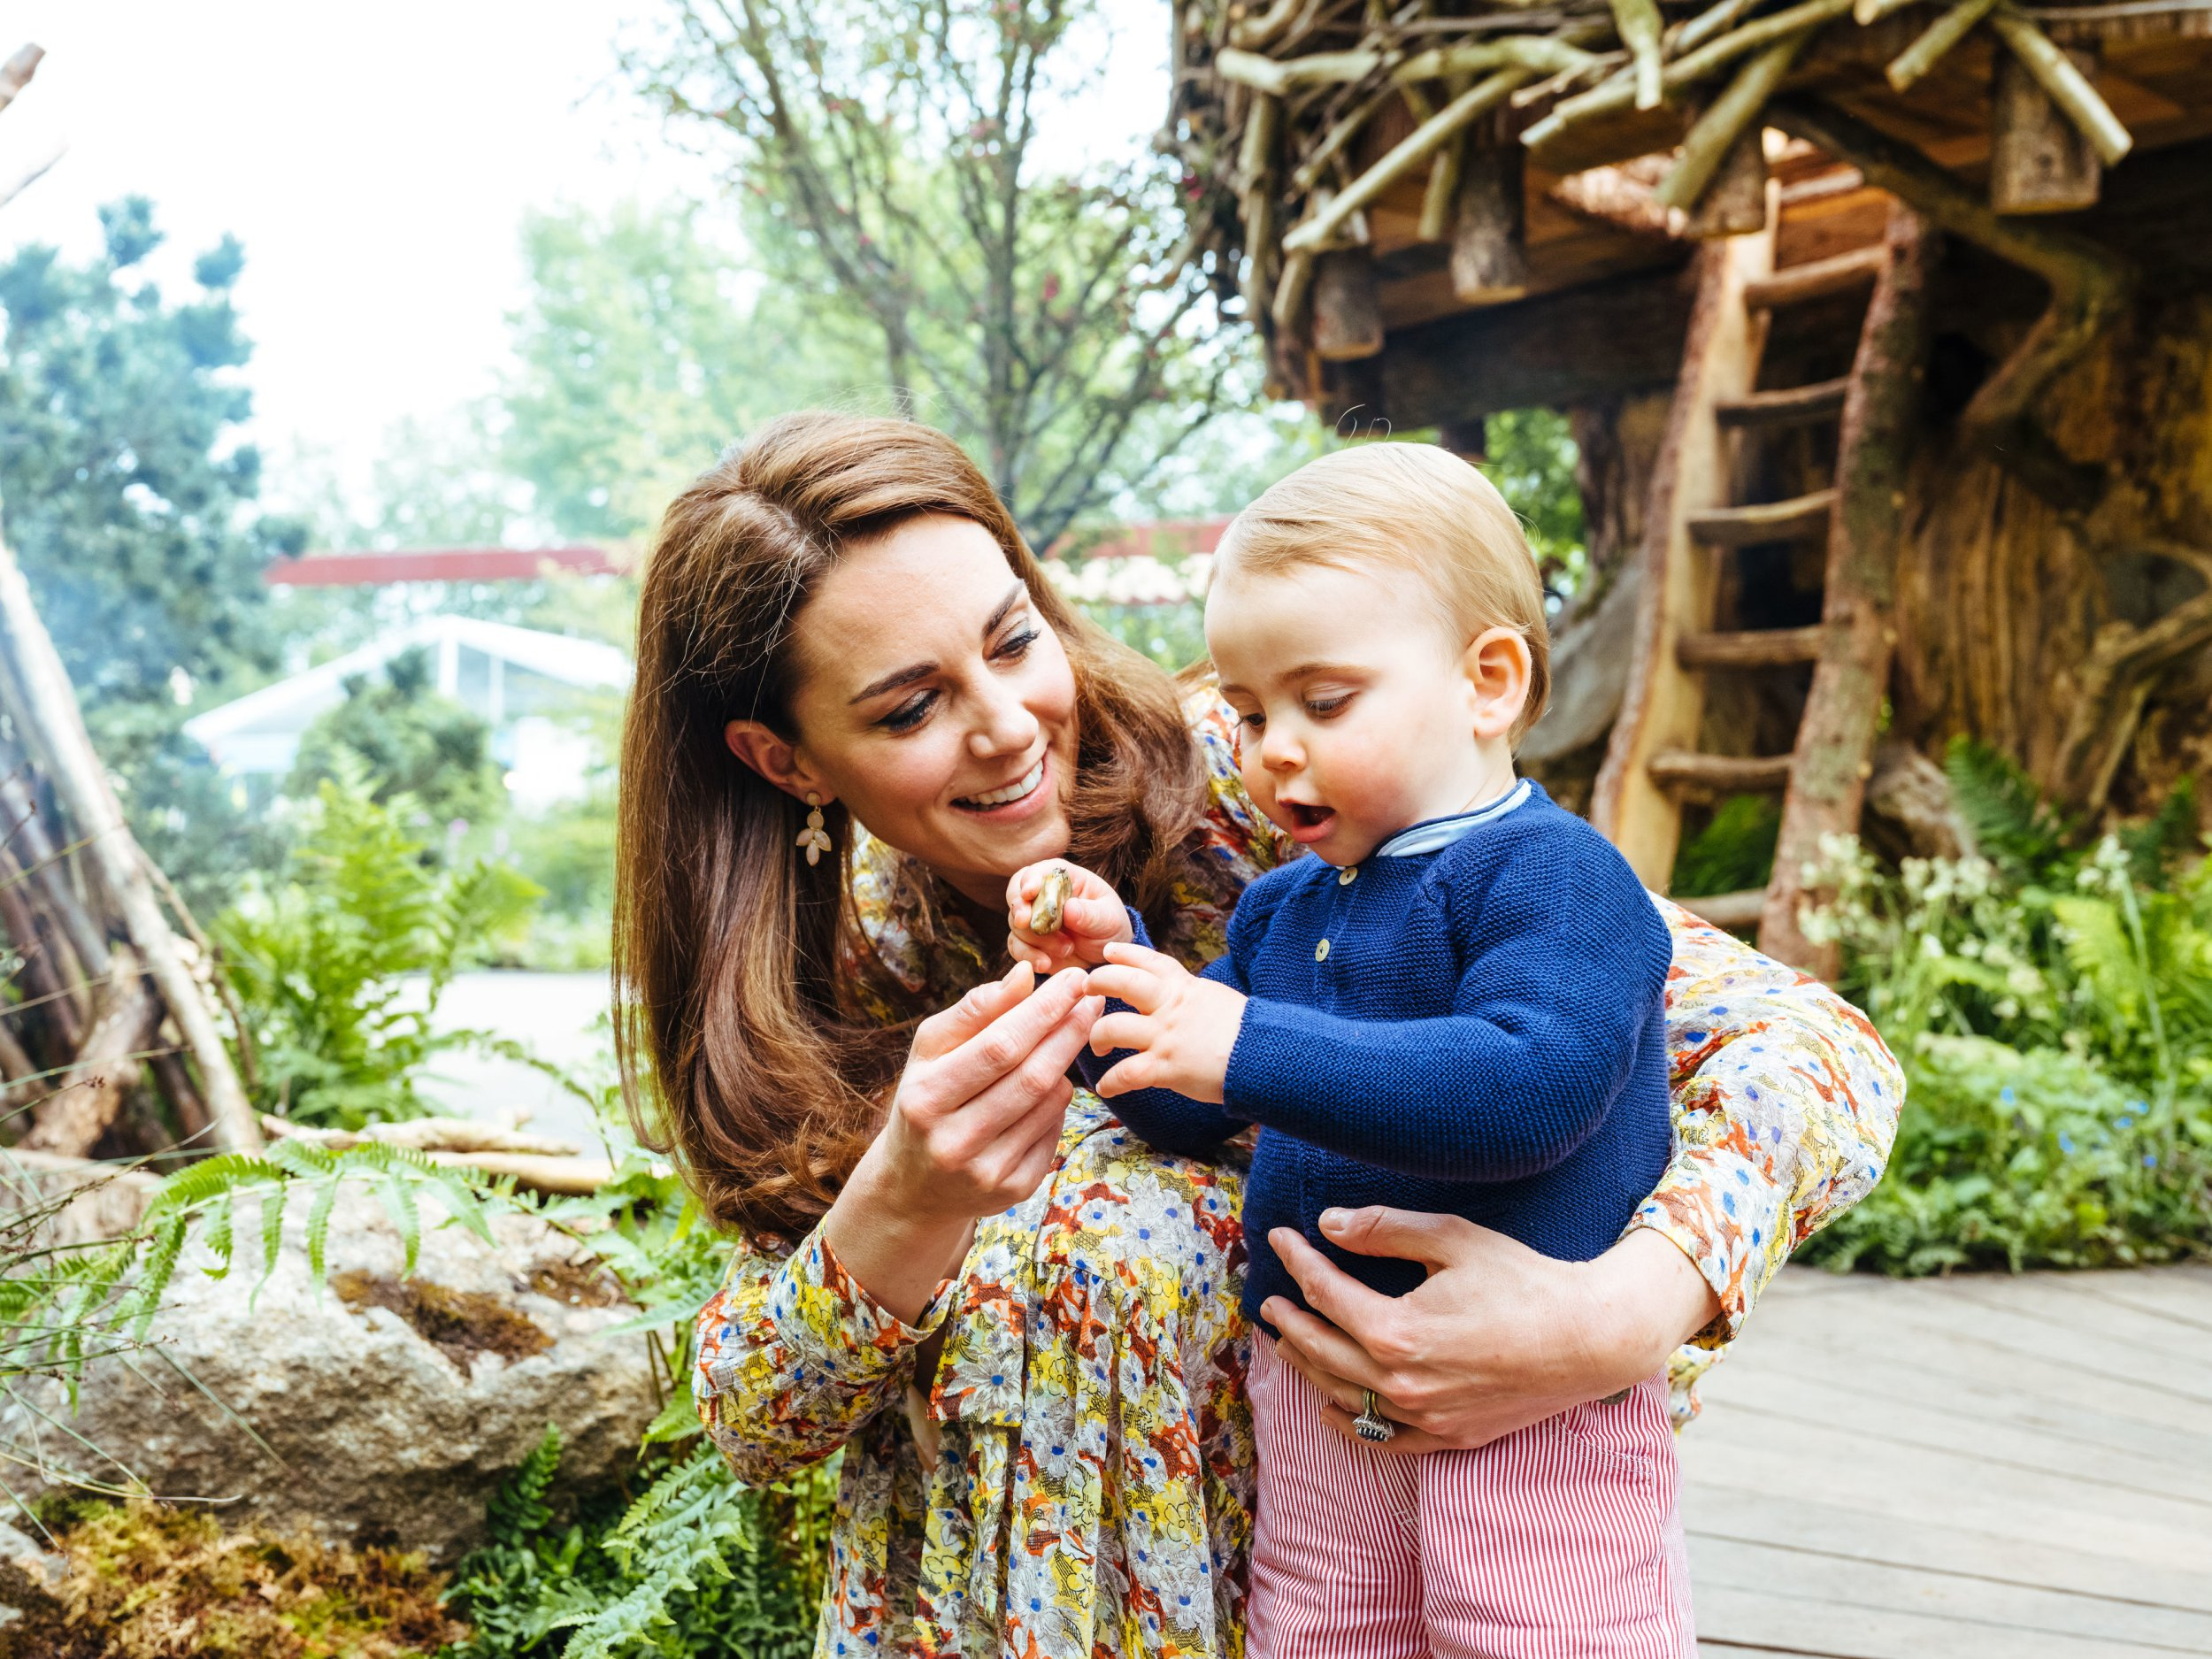 How to see Kate Middleton's Chelsea Flower Show garden